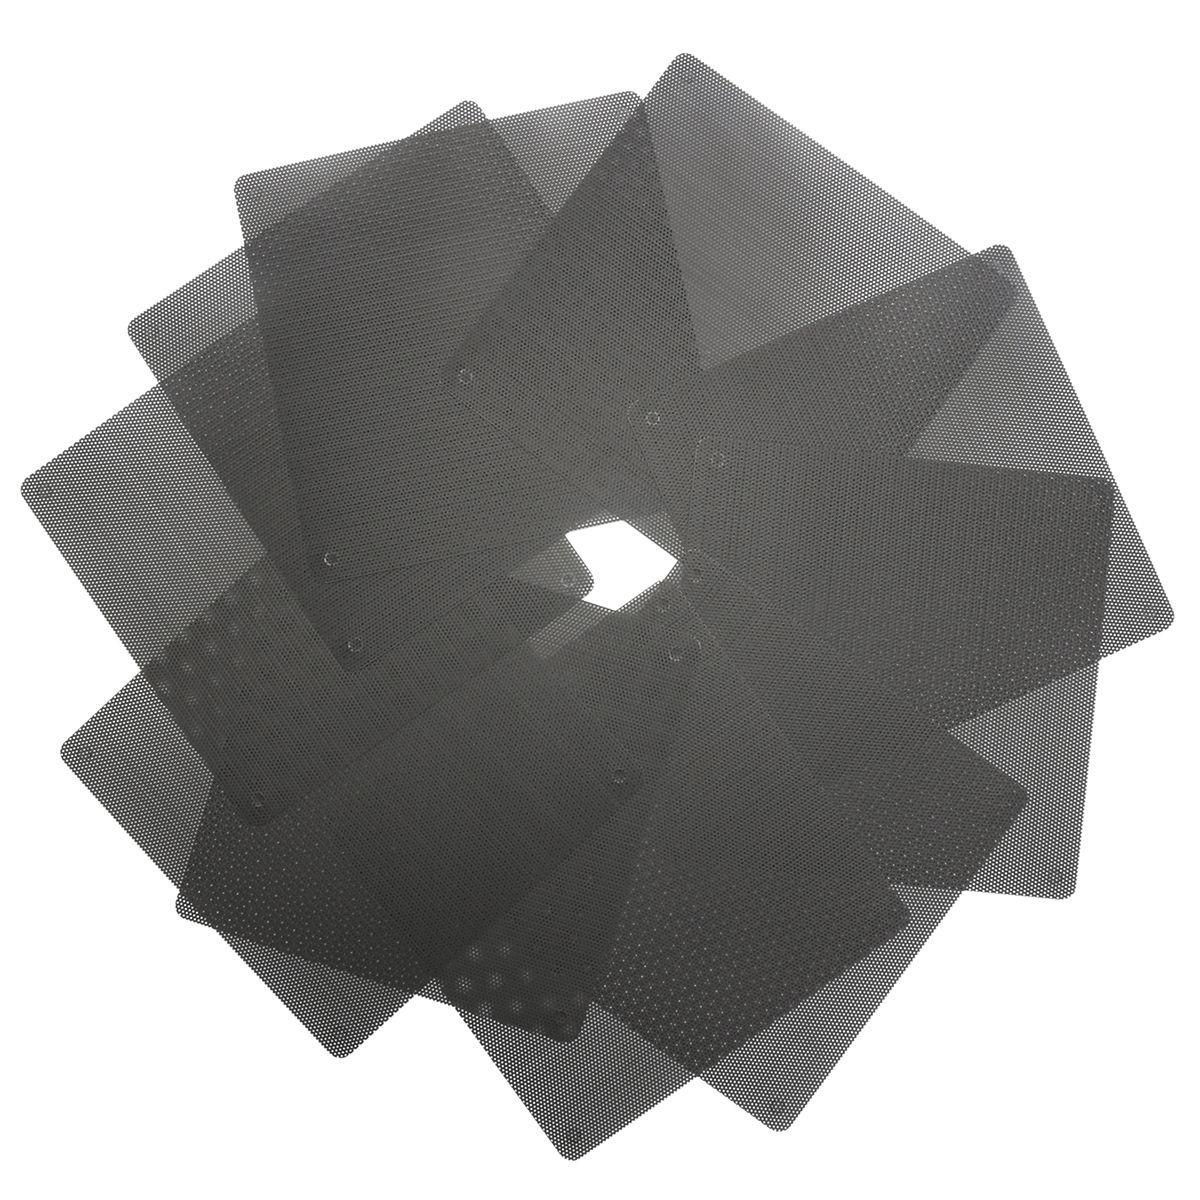 10x Black 140mm Pvc Computer Pc Cooler Fan Case Cover Dust Filter Deepcool Xfan 12cm Casing Mesh Cuttable